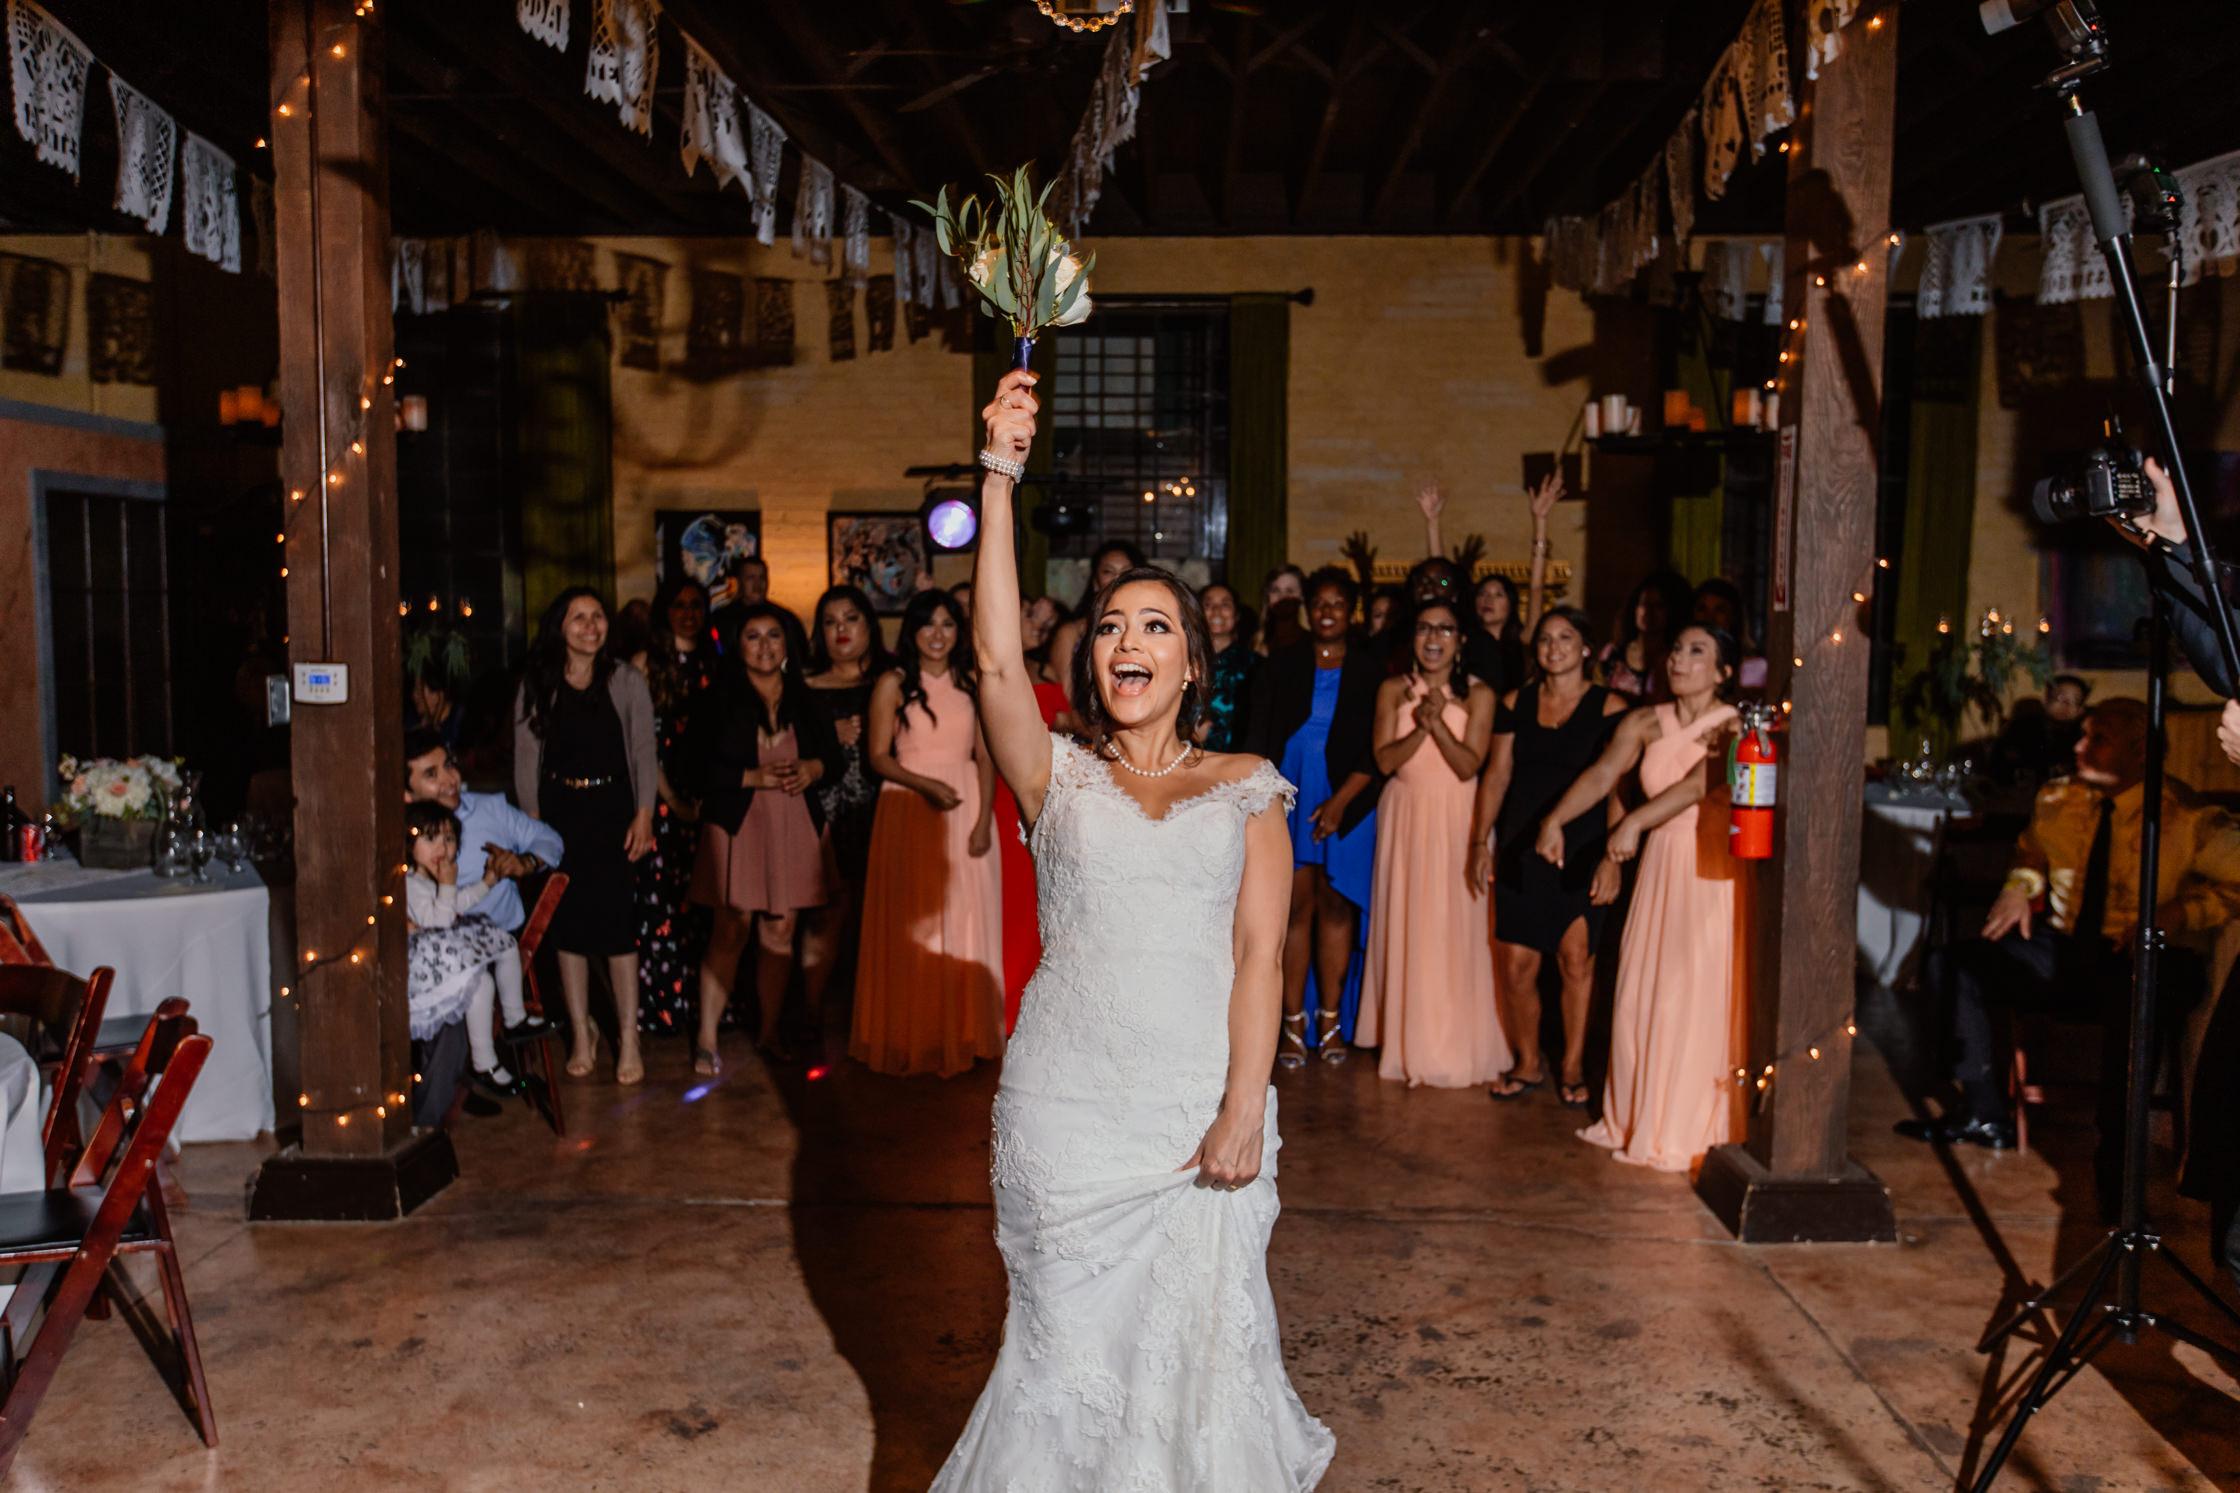 luis_joanna_wedding-120.jpg